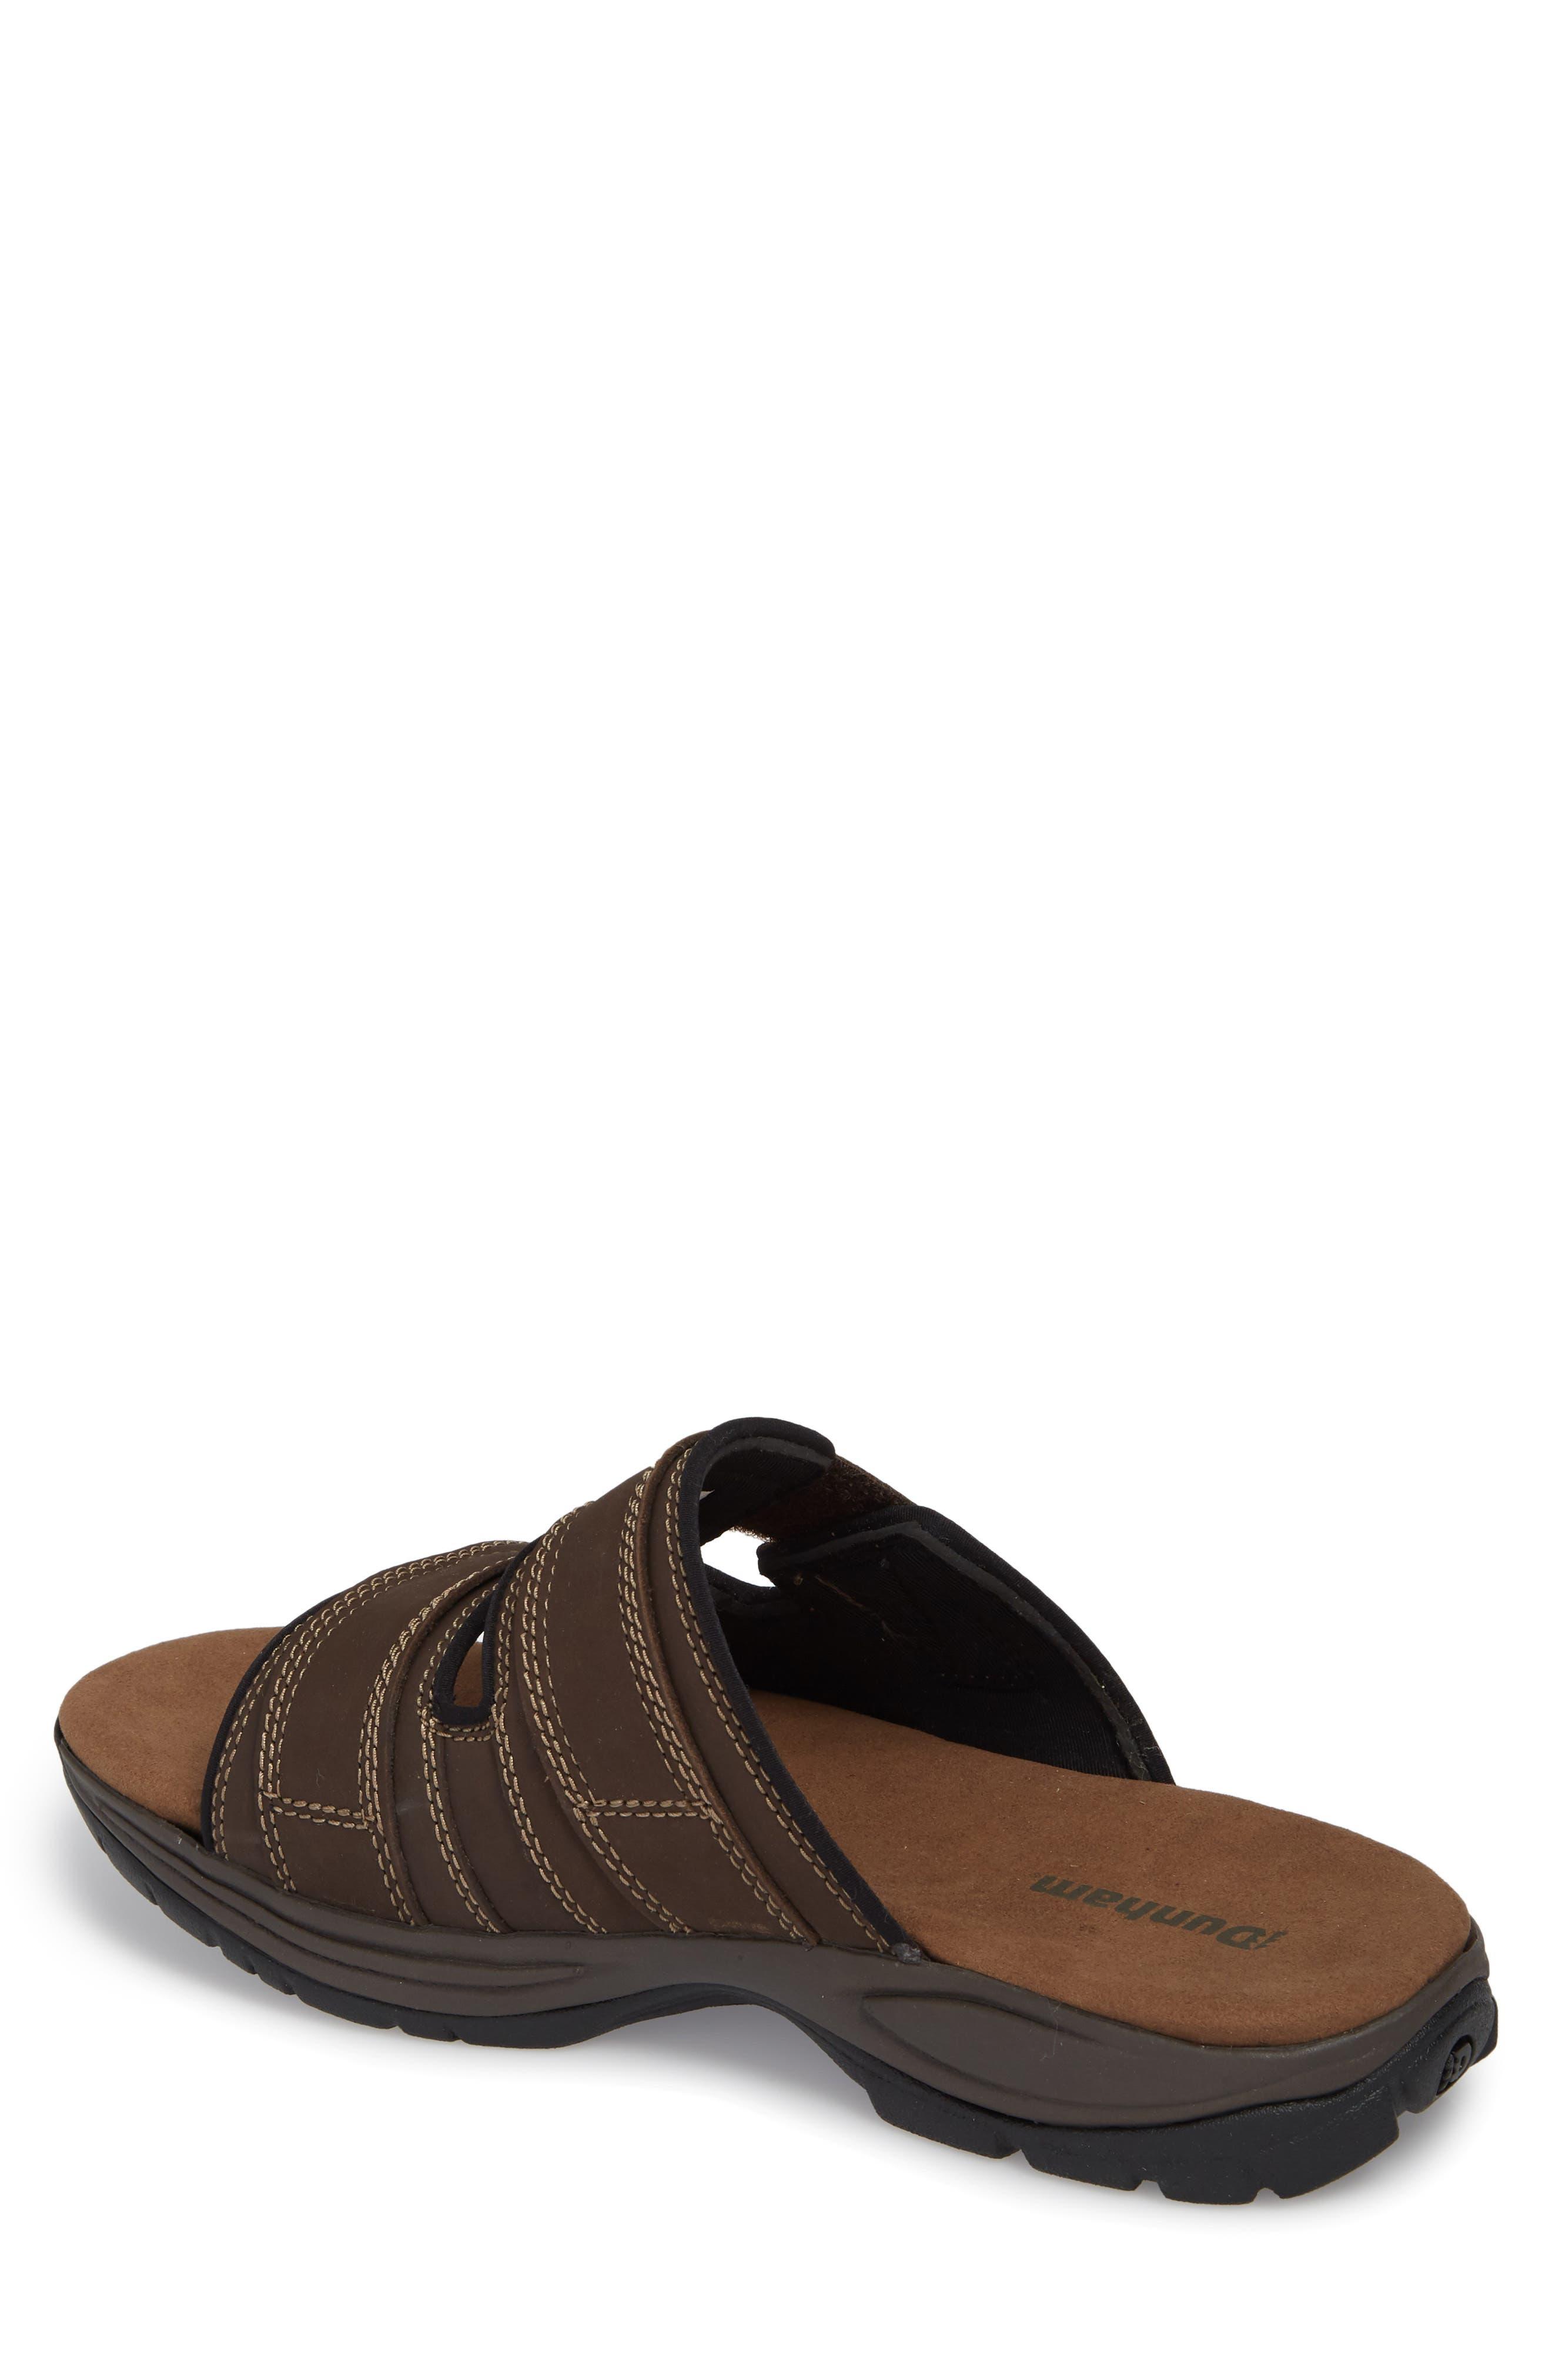 Newport Slide Sandal,                             Alternate thumbnail 2, color,                             DARK BROWN LEATHER